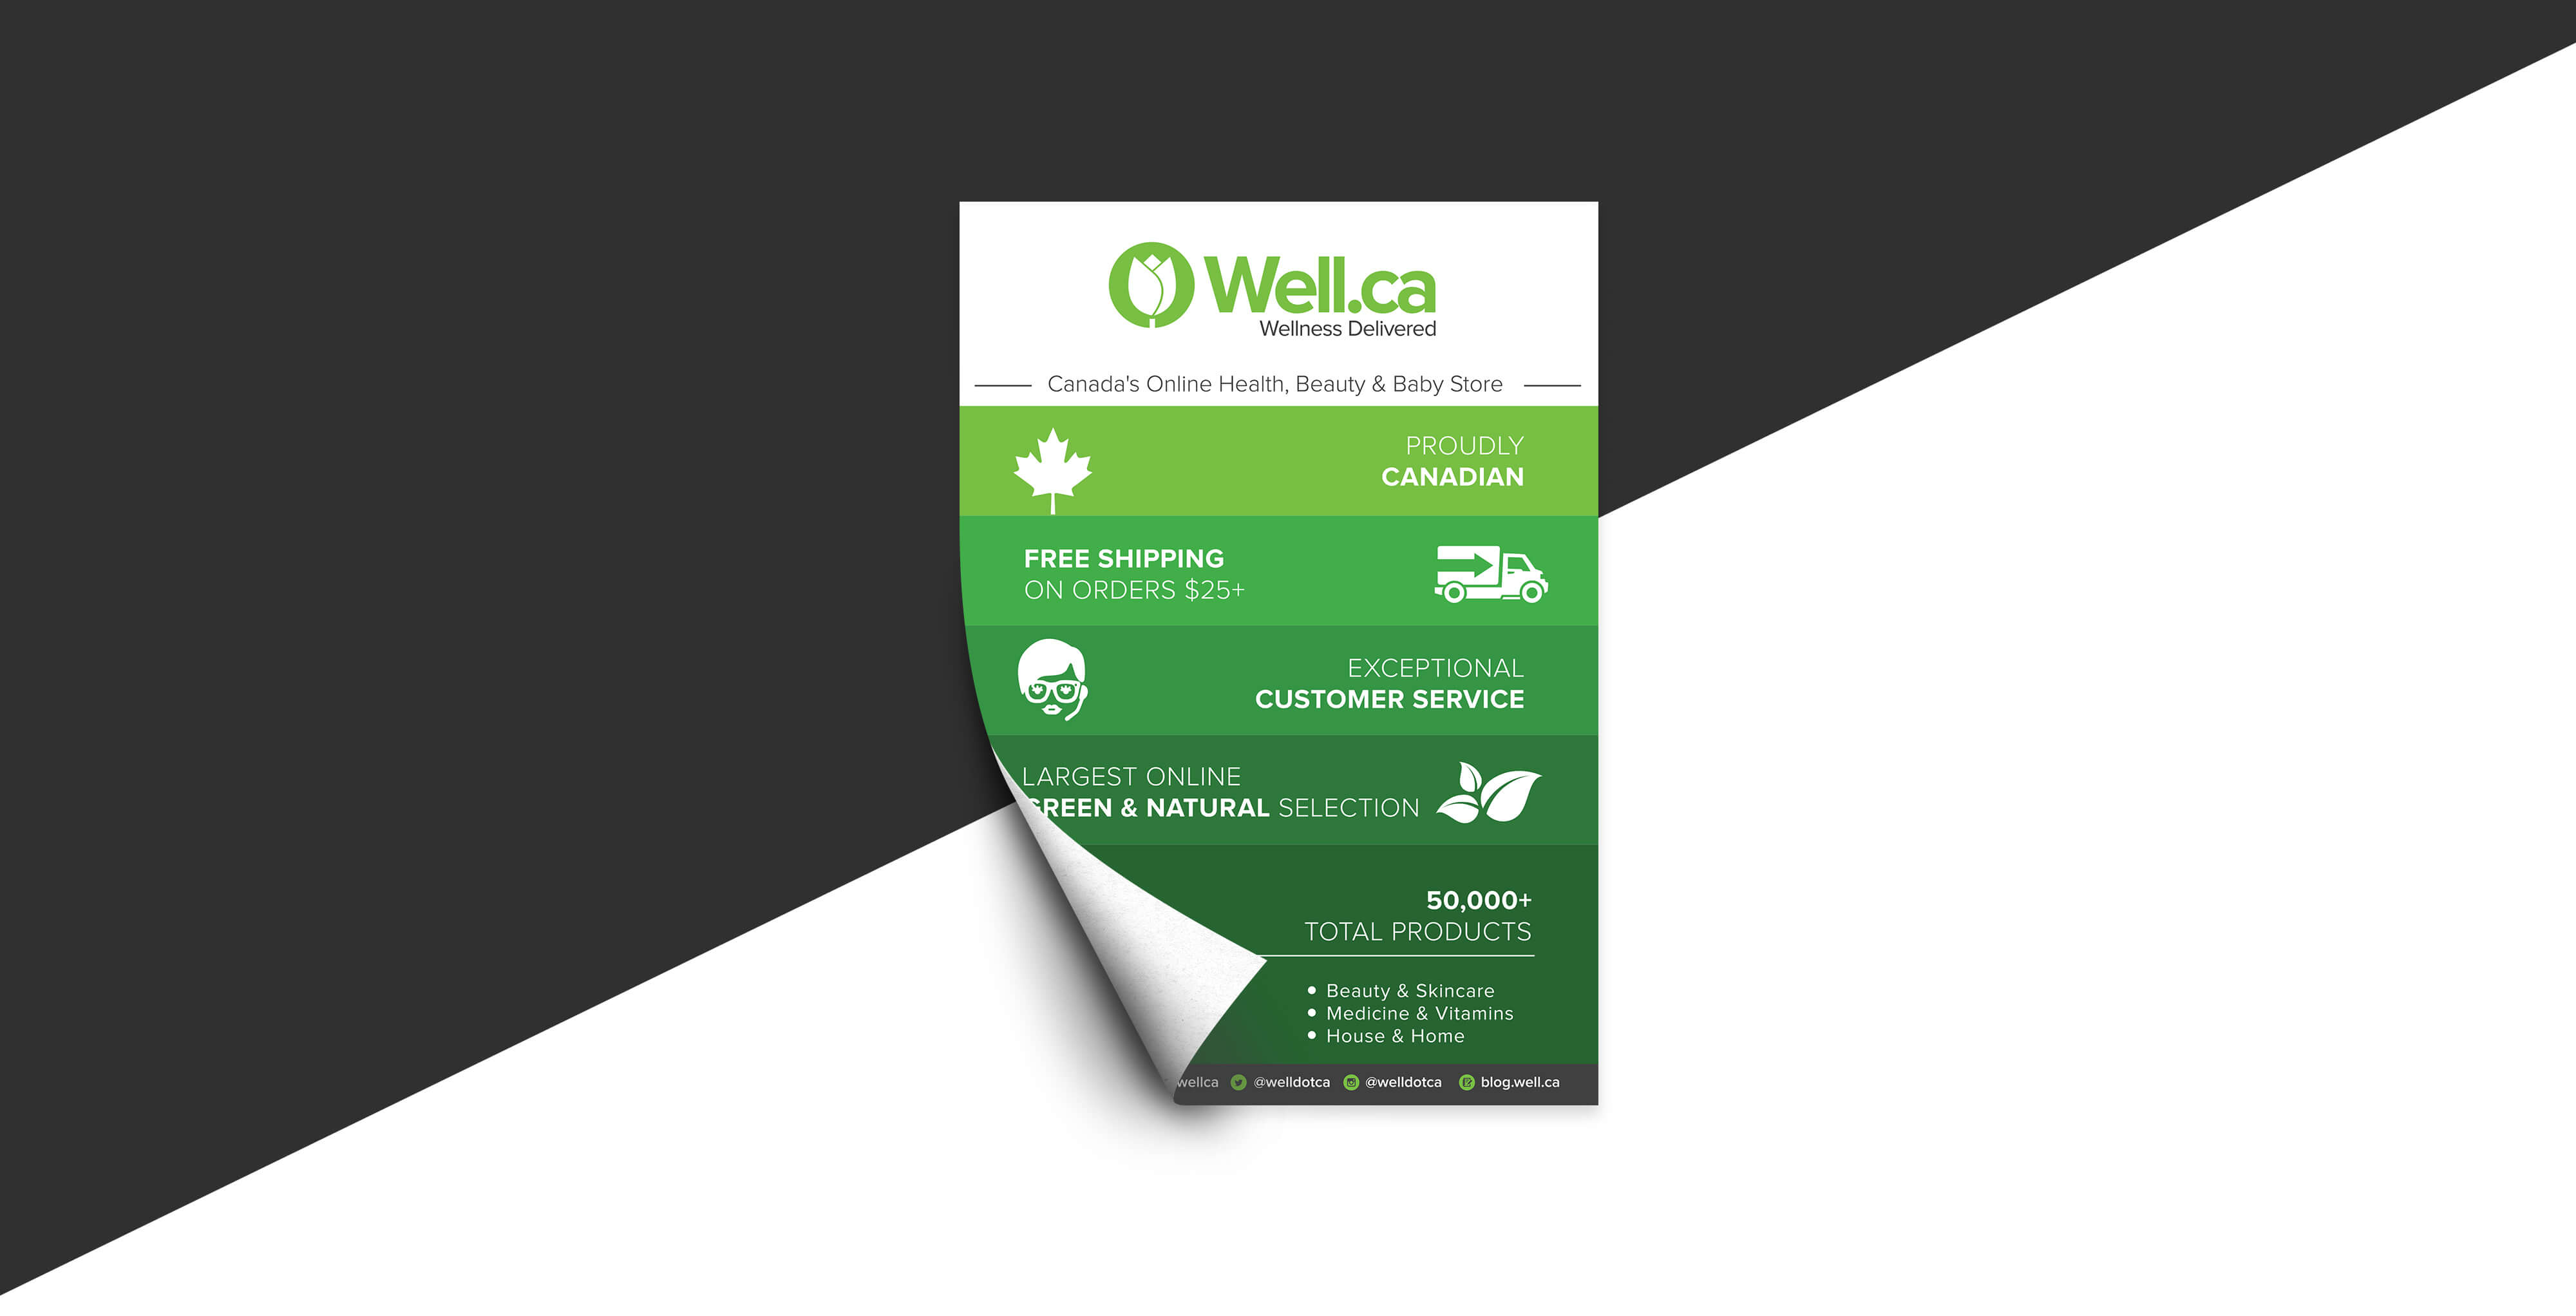 Well.ca Rebranding by Preet Arjun Singh DesignSingh.com Toronto